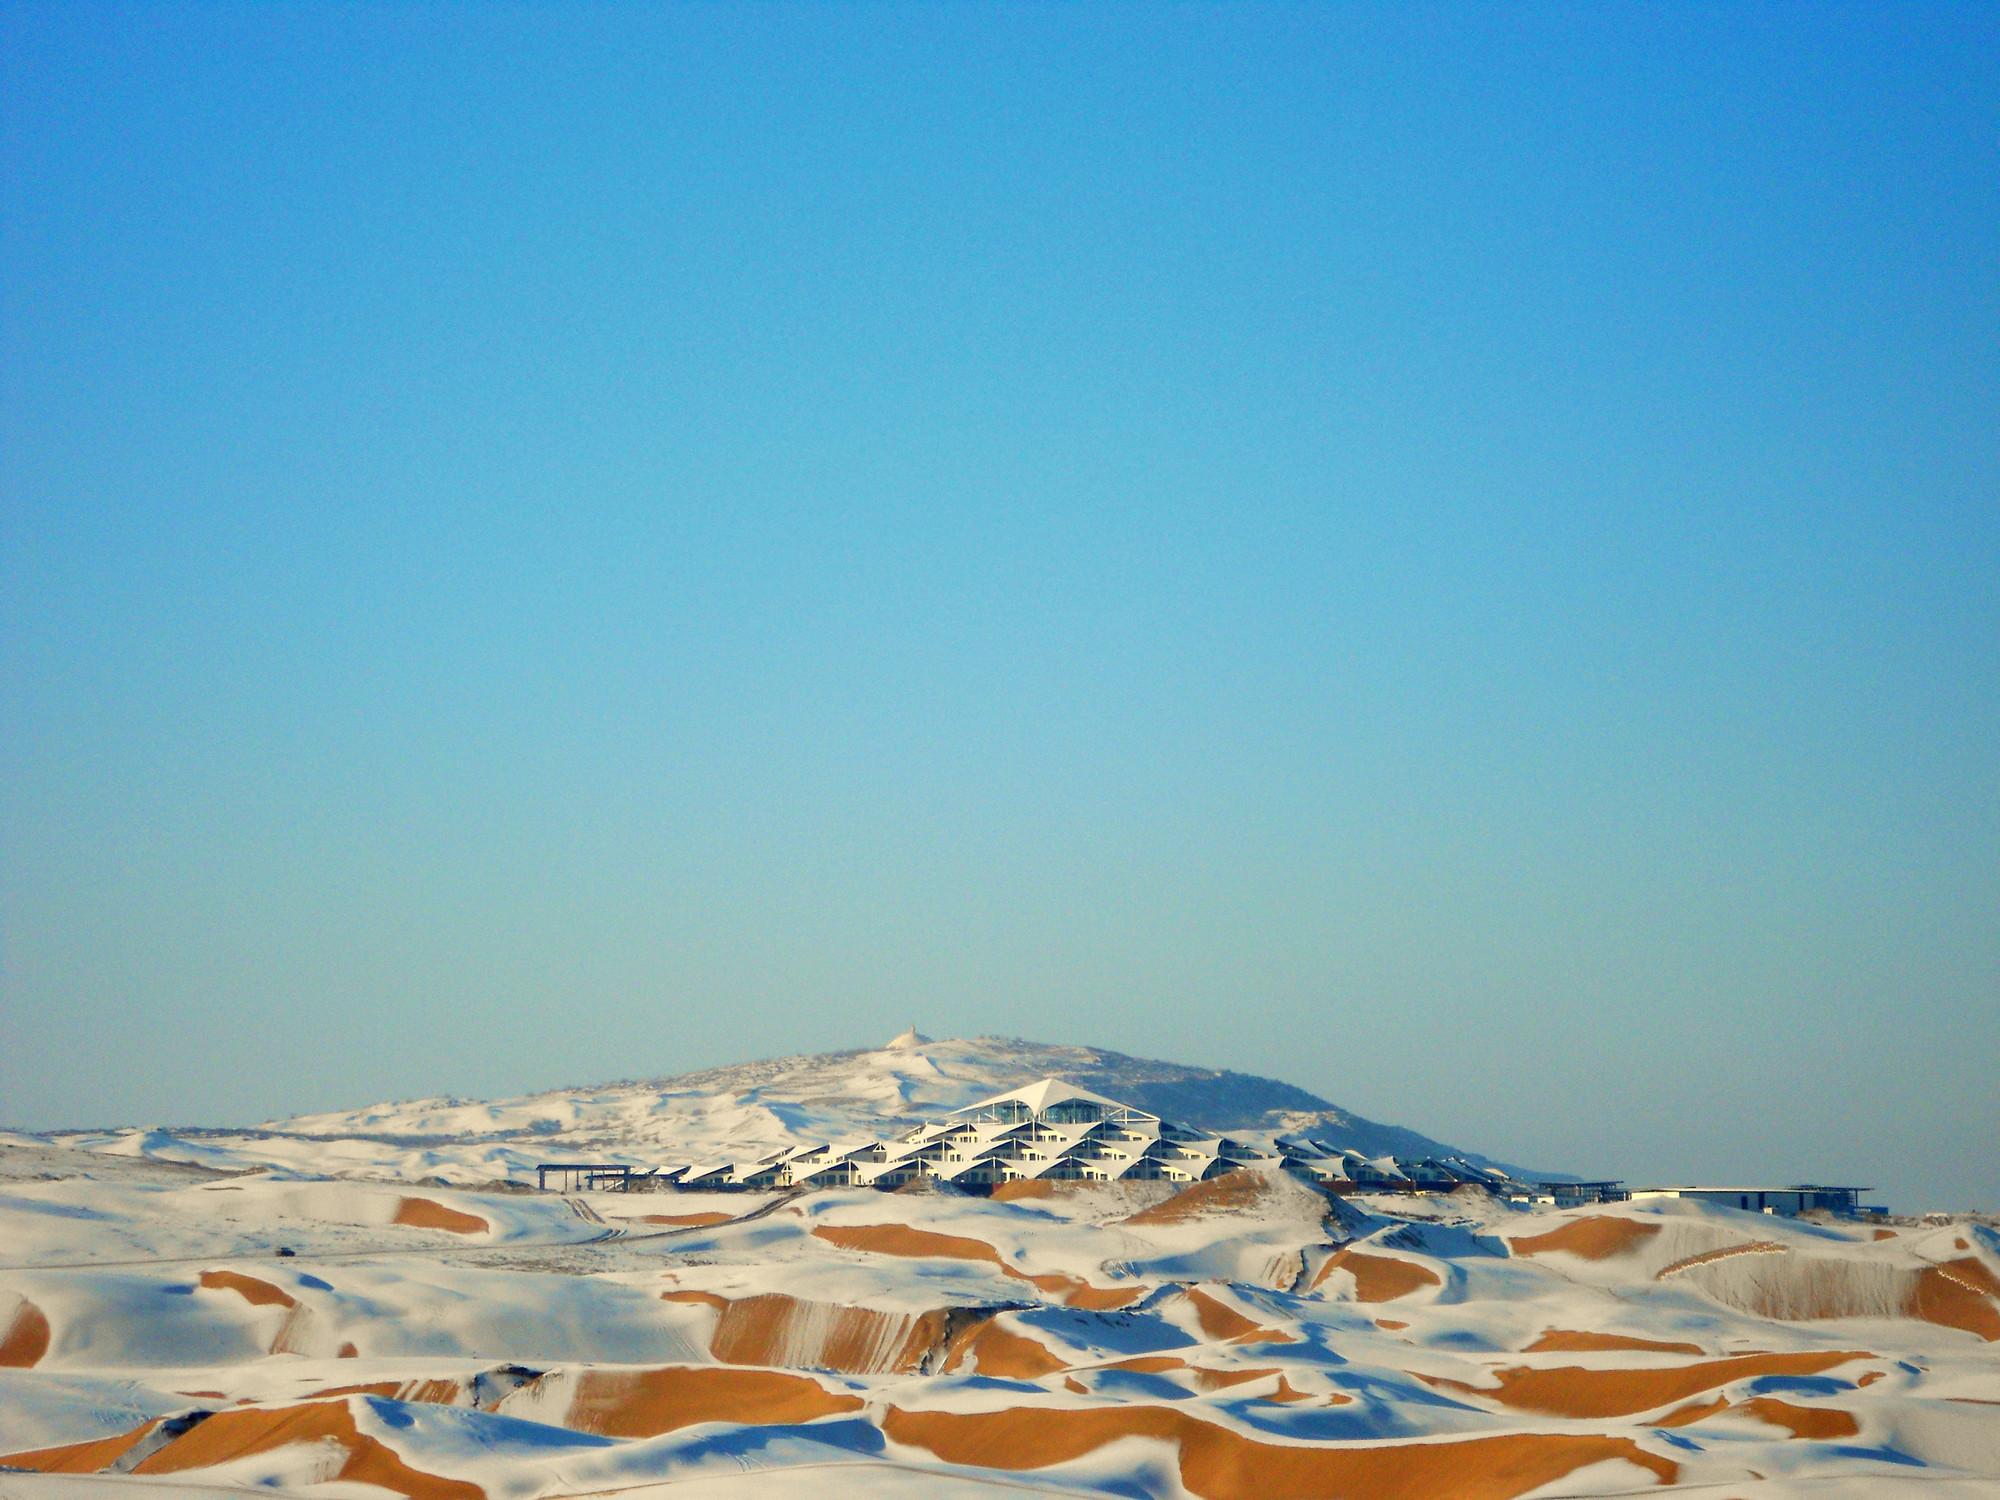 Gallery Of Xiangshawan Desert Lotus Hotel Plat Architects 6